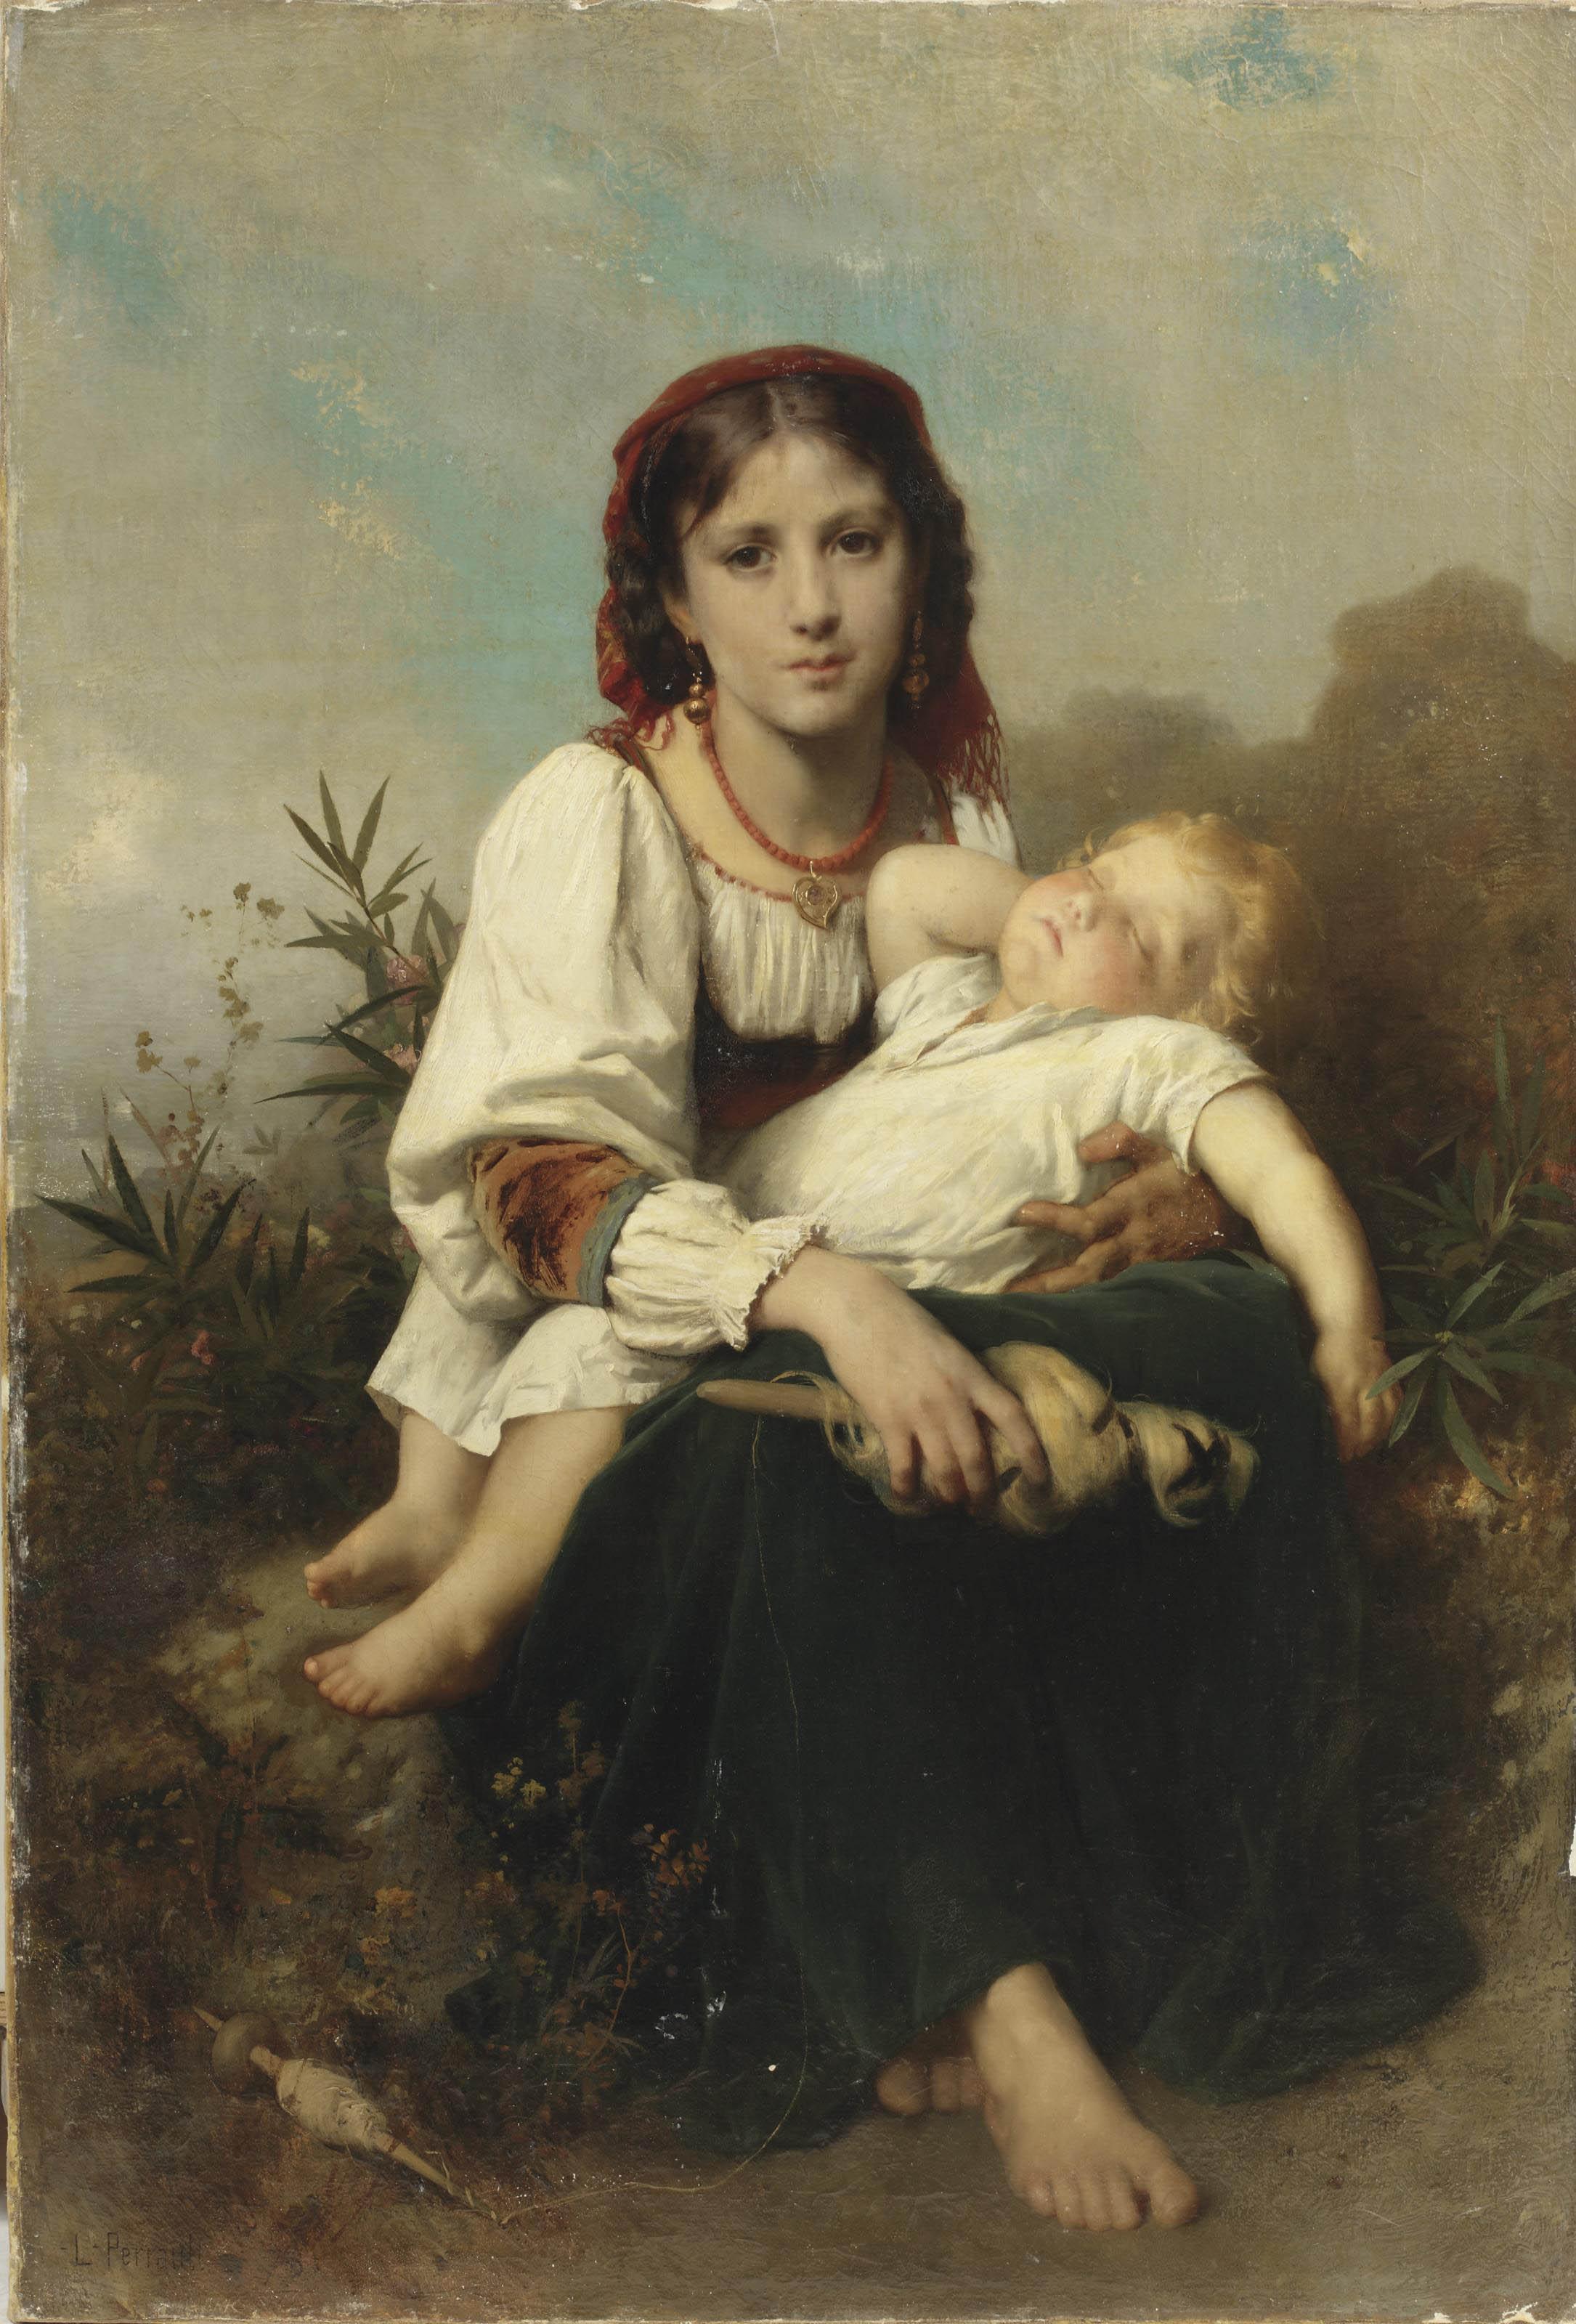 'La Soeur gardienne'